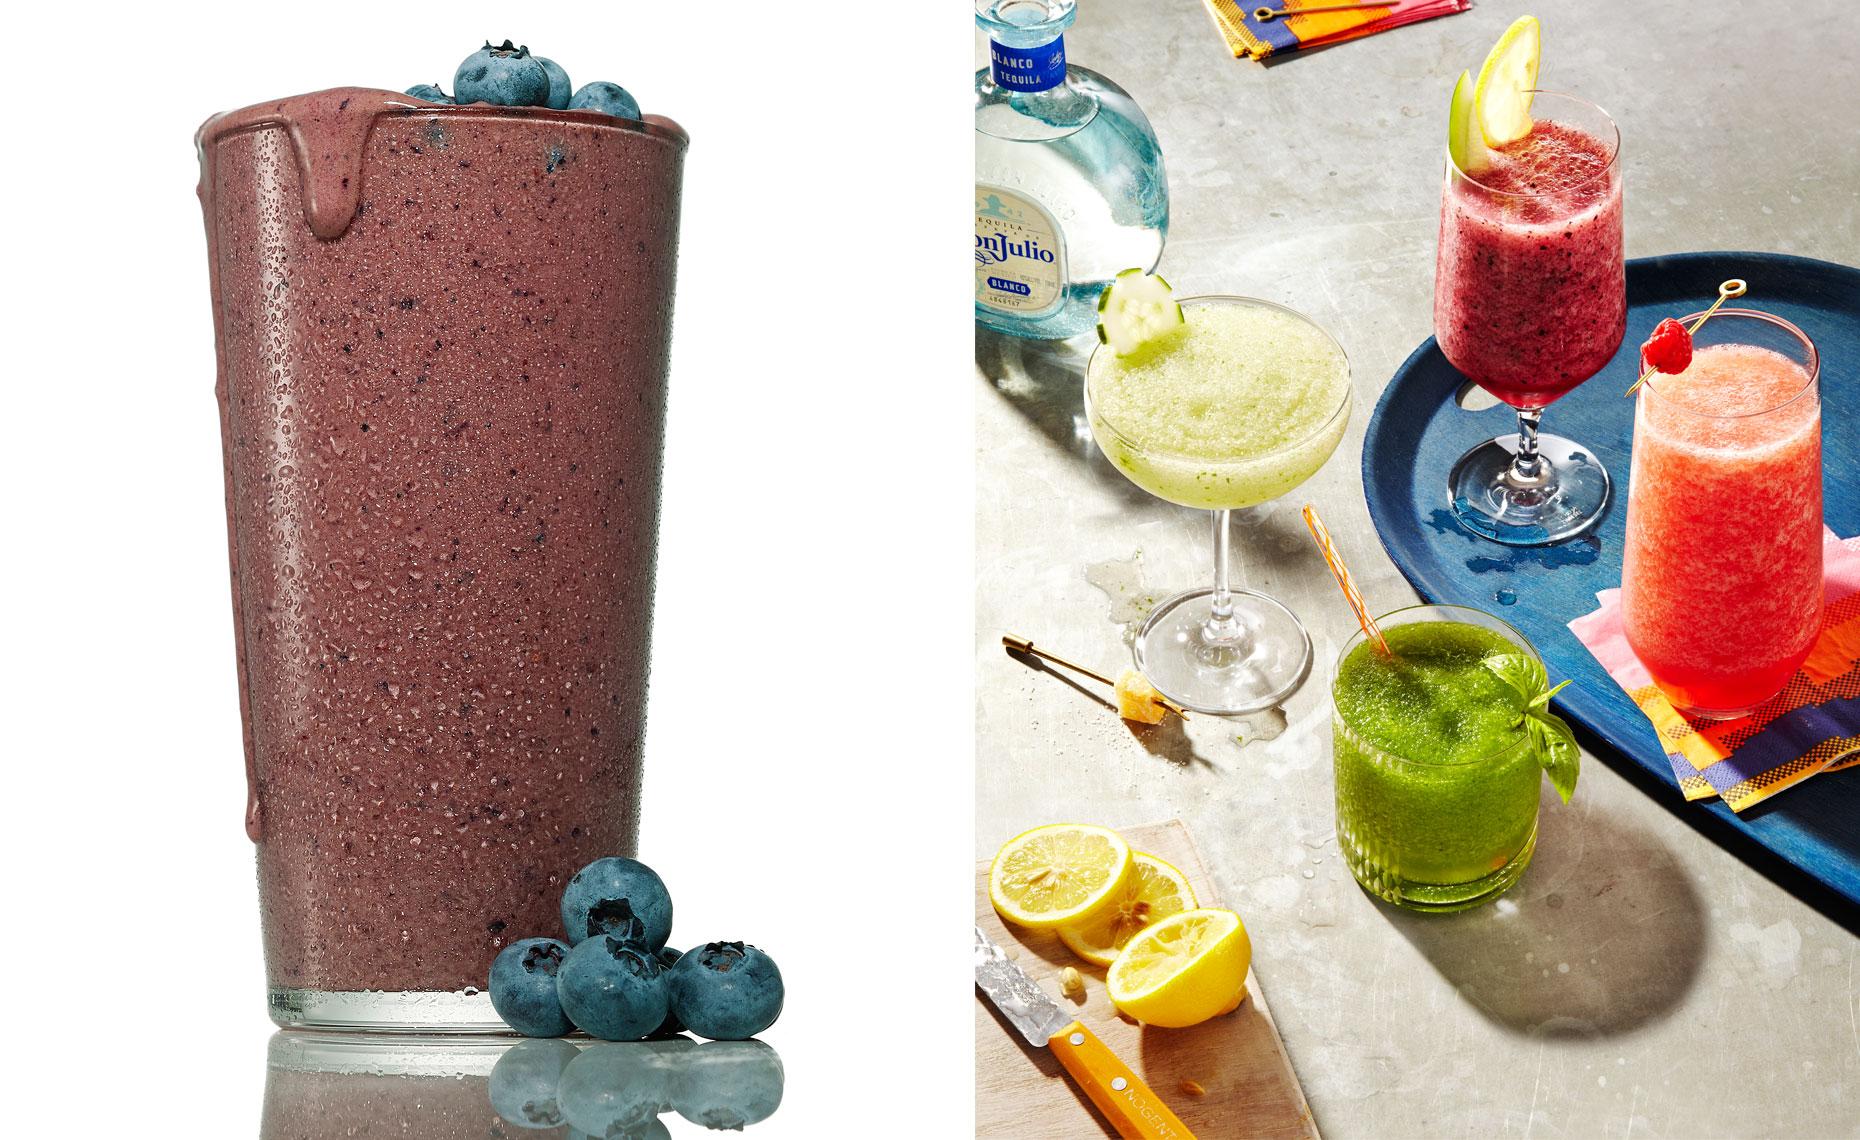 purple-smoothie-and-frozen-drinks.jpg